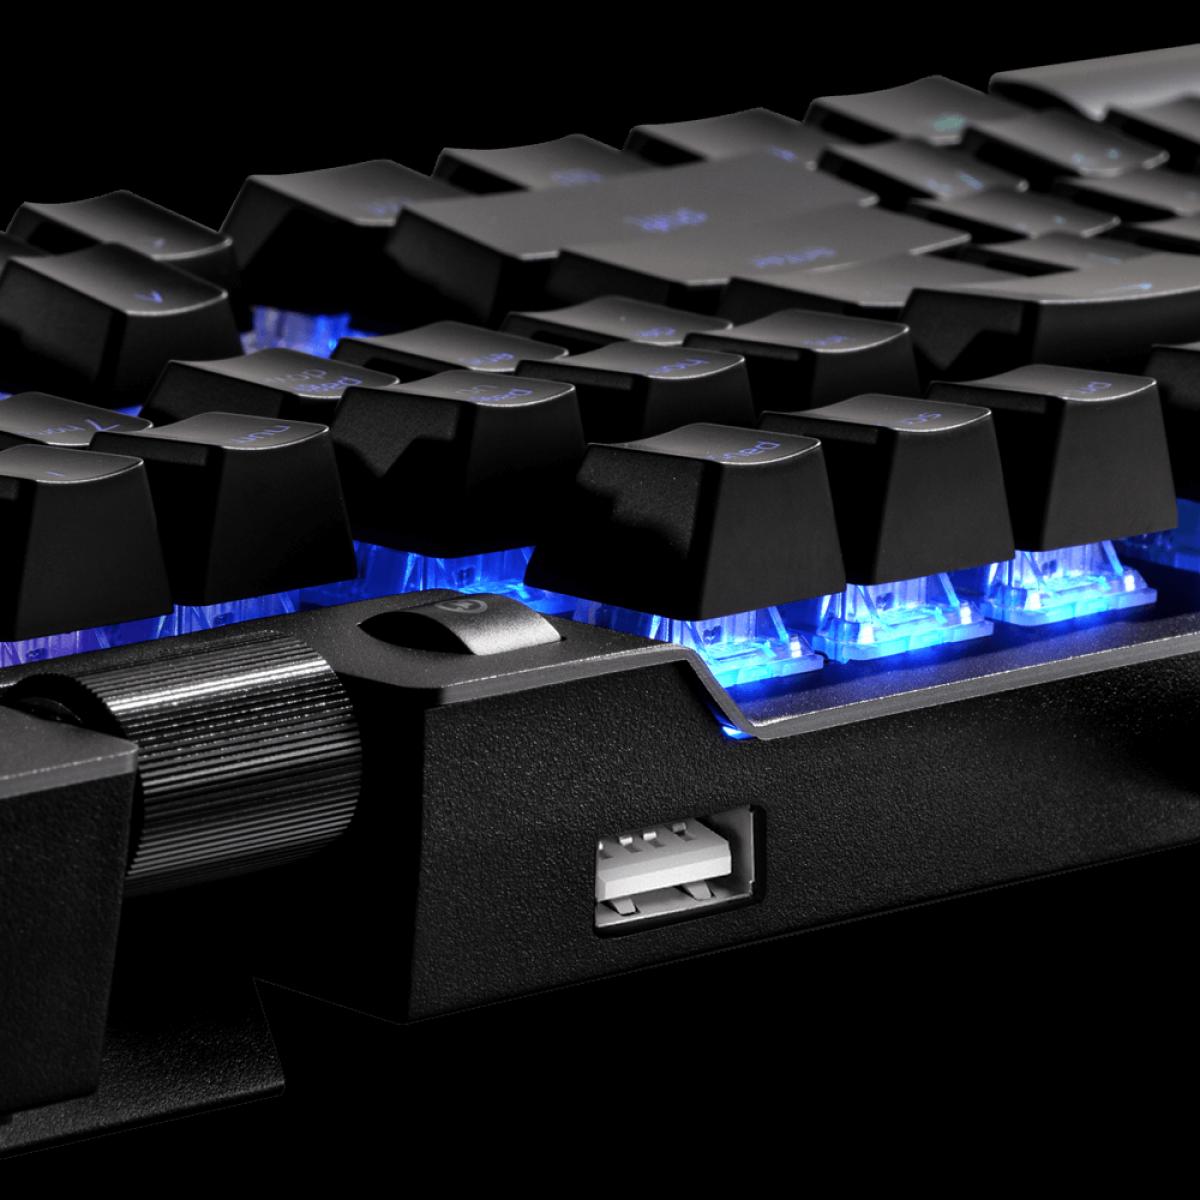 Teclado Mecânico XPG, Summoner, RGB, Switch Cherry MX RGB Silver, ANSI, Black, SUMMONER4C-BKCWW